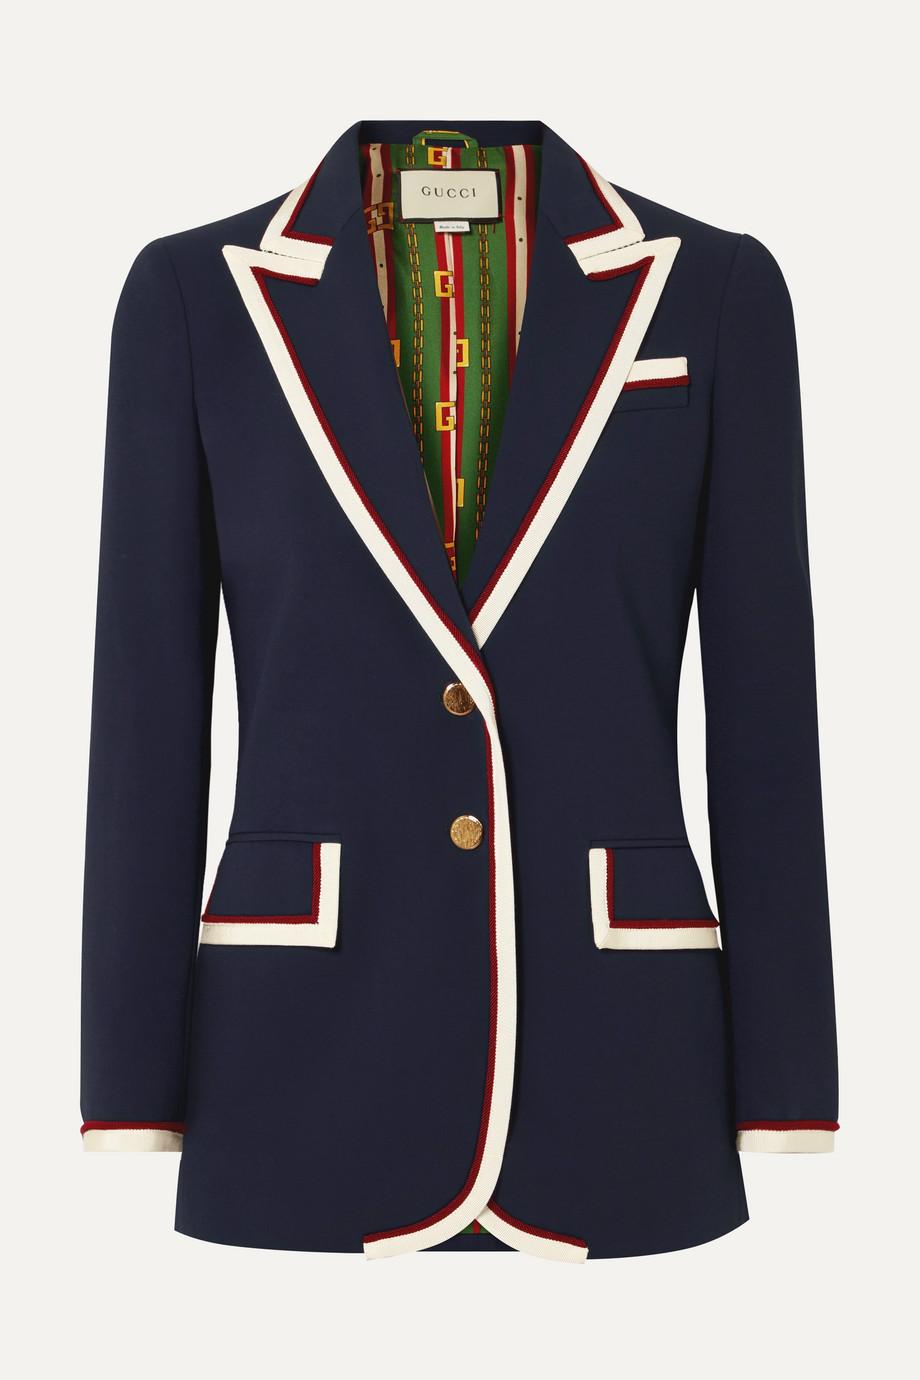 Gucci 罗缎边饰卡迪面料西装式外套